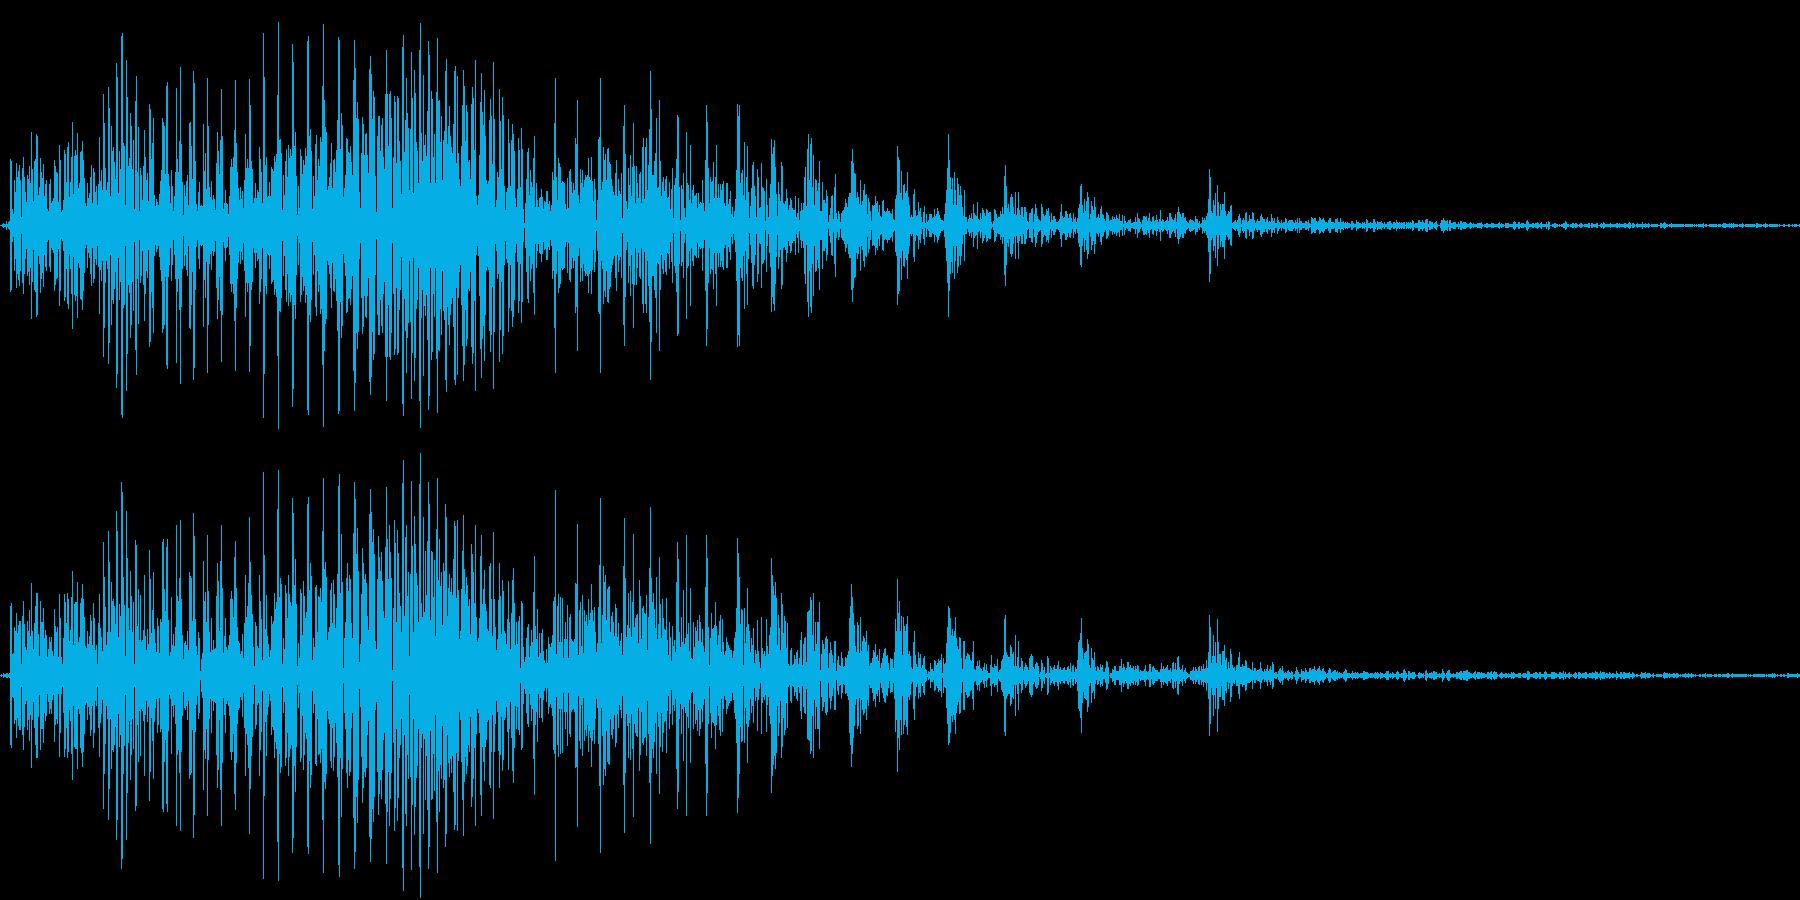 Piko ピコハン・幼児向け玩具の音の再生済みの波形